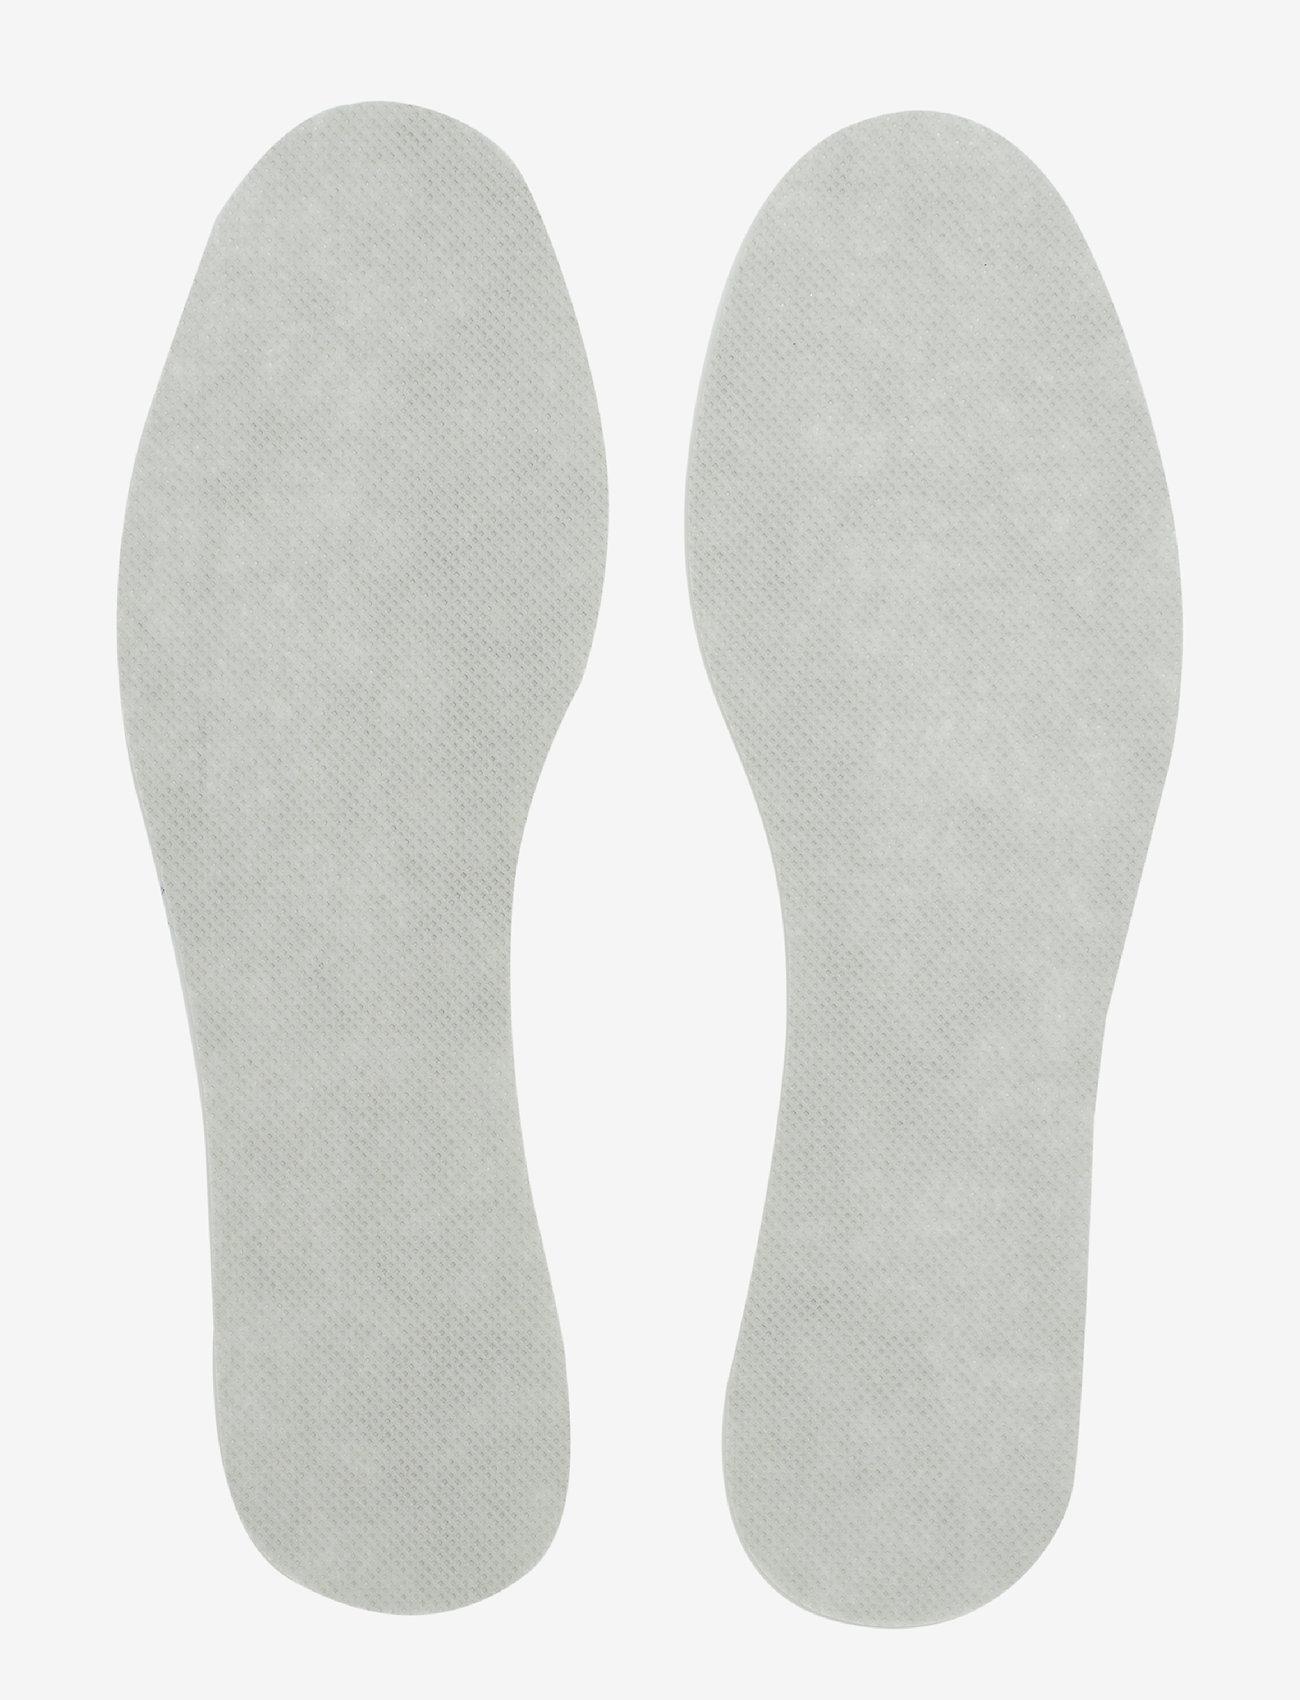 Springyard - Deo Scent, Unisex Classic - grey - 1